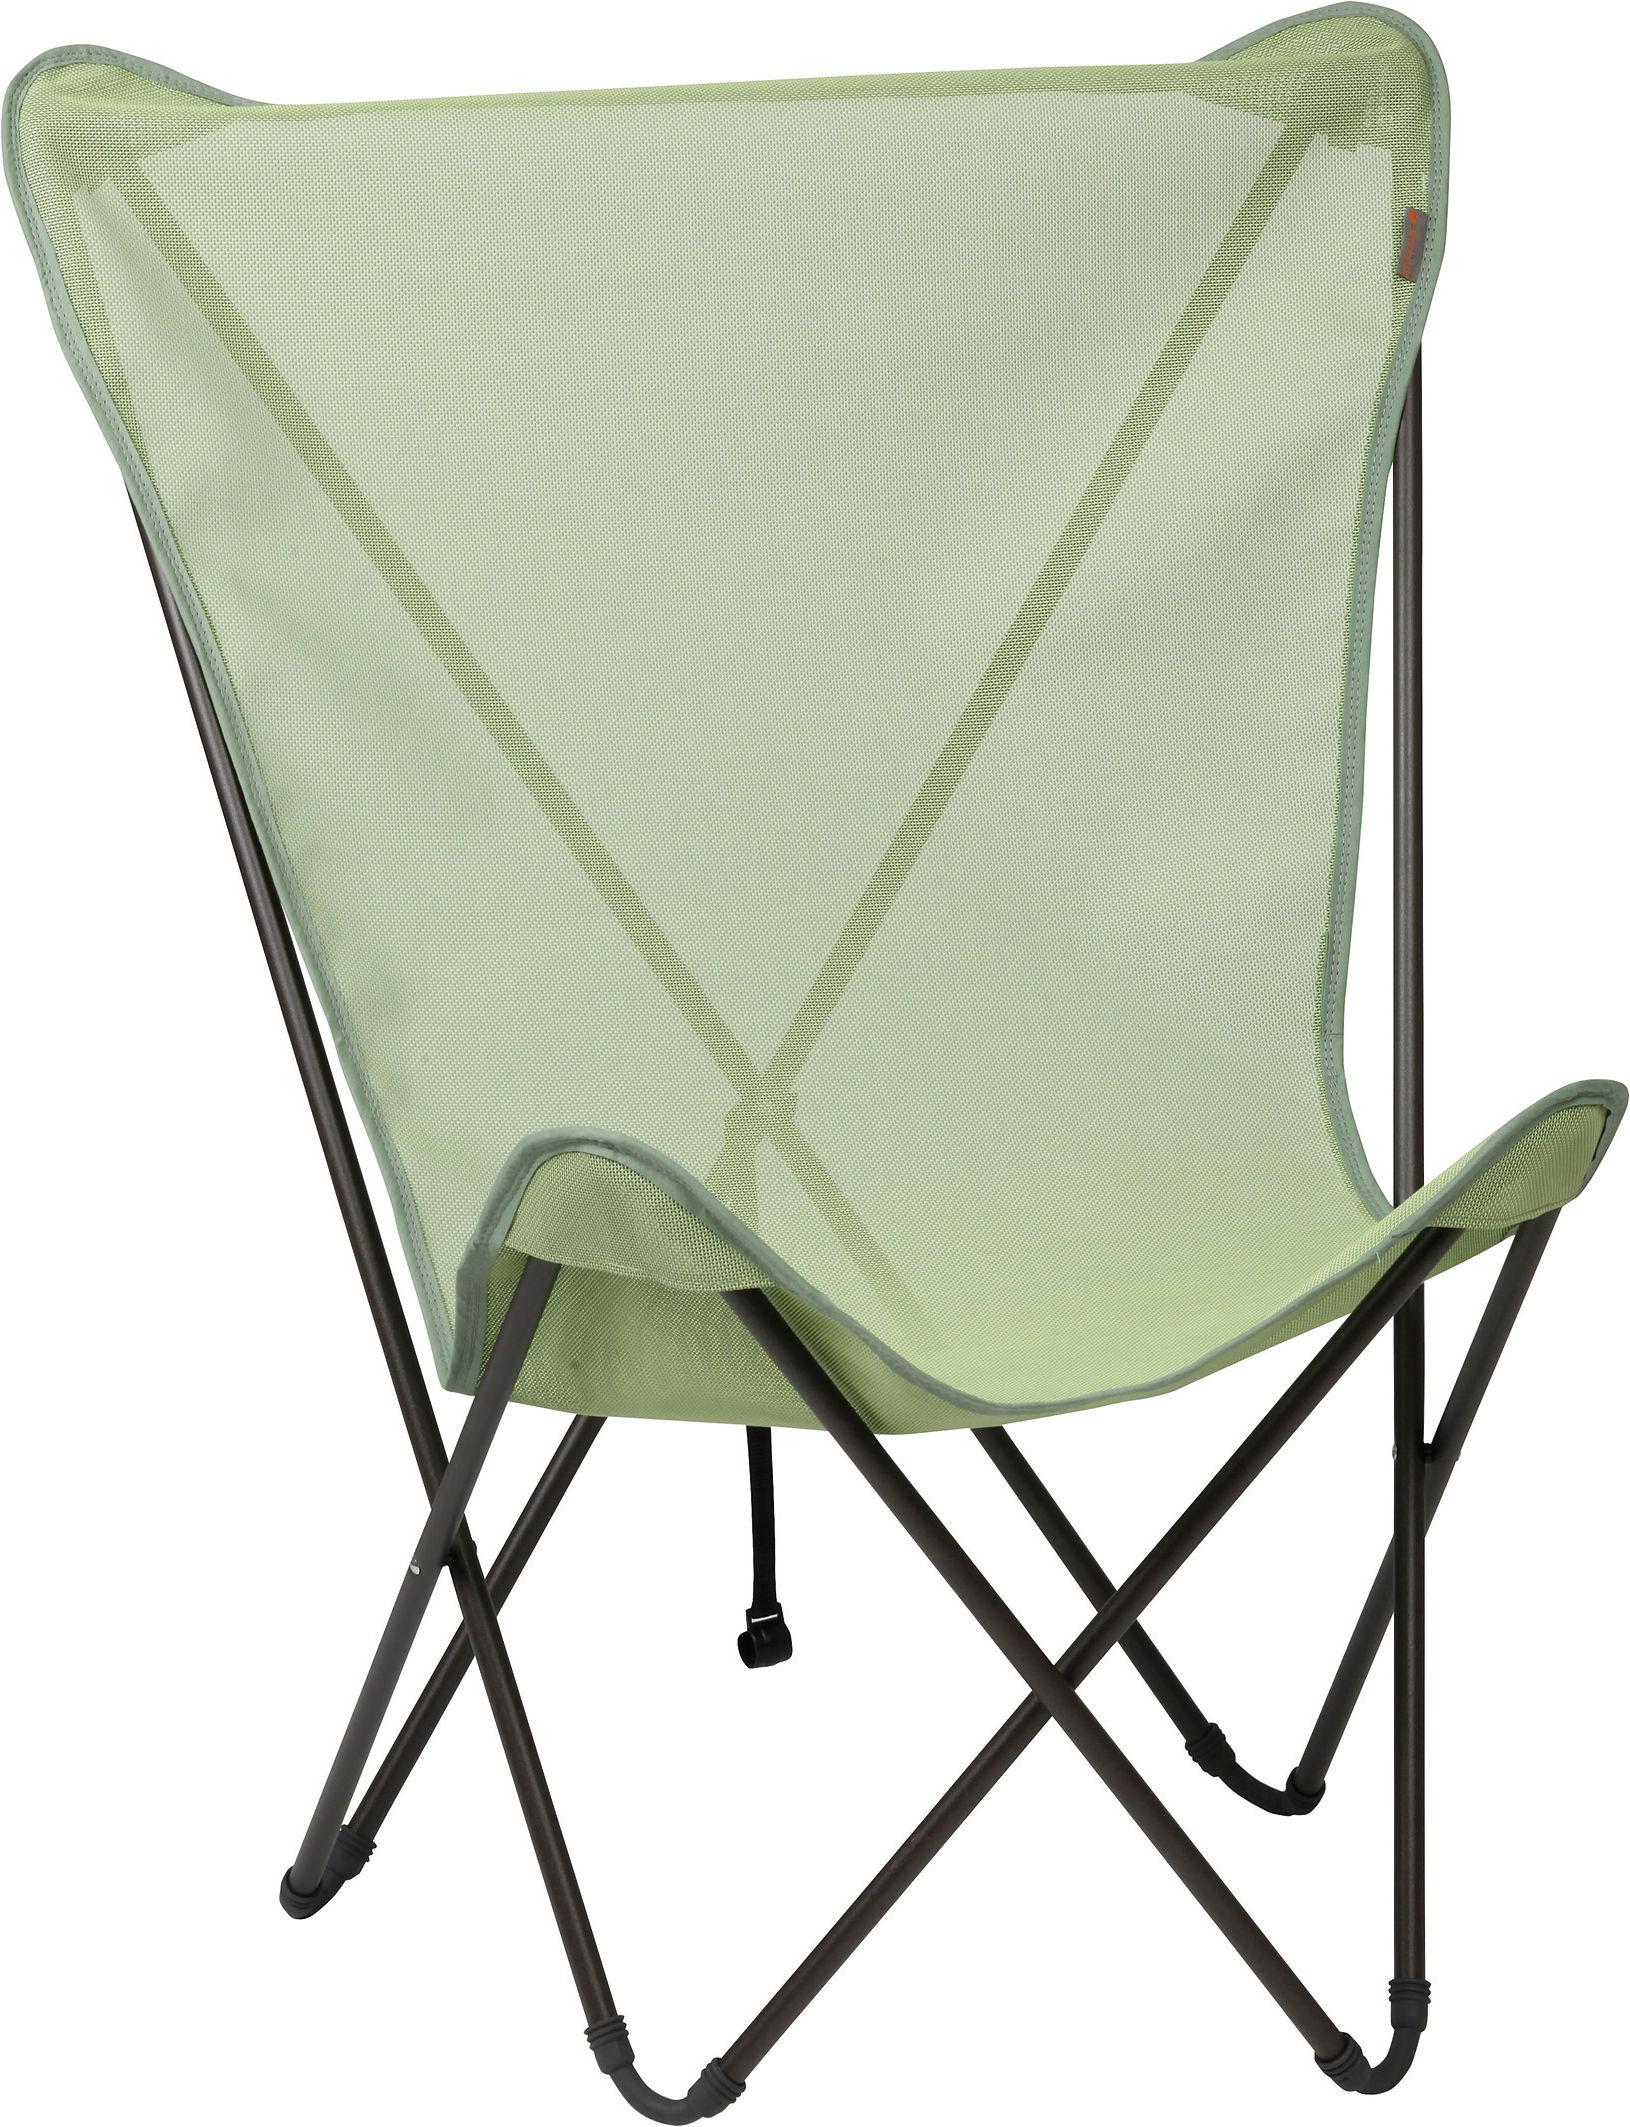 fauteuil maxi pop up pliable vert absinthe structure marron lafuma. Black Bedroom Furniture Sets. Home Design Ideas